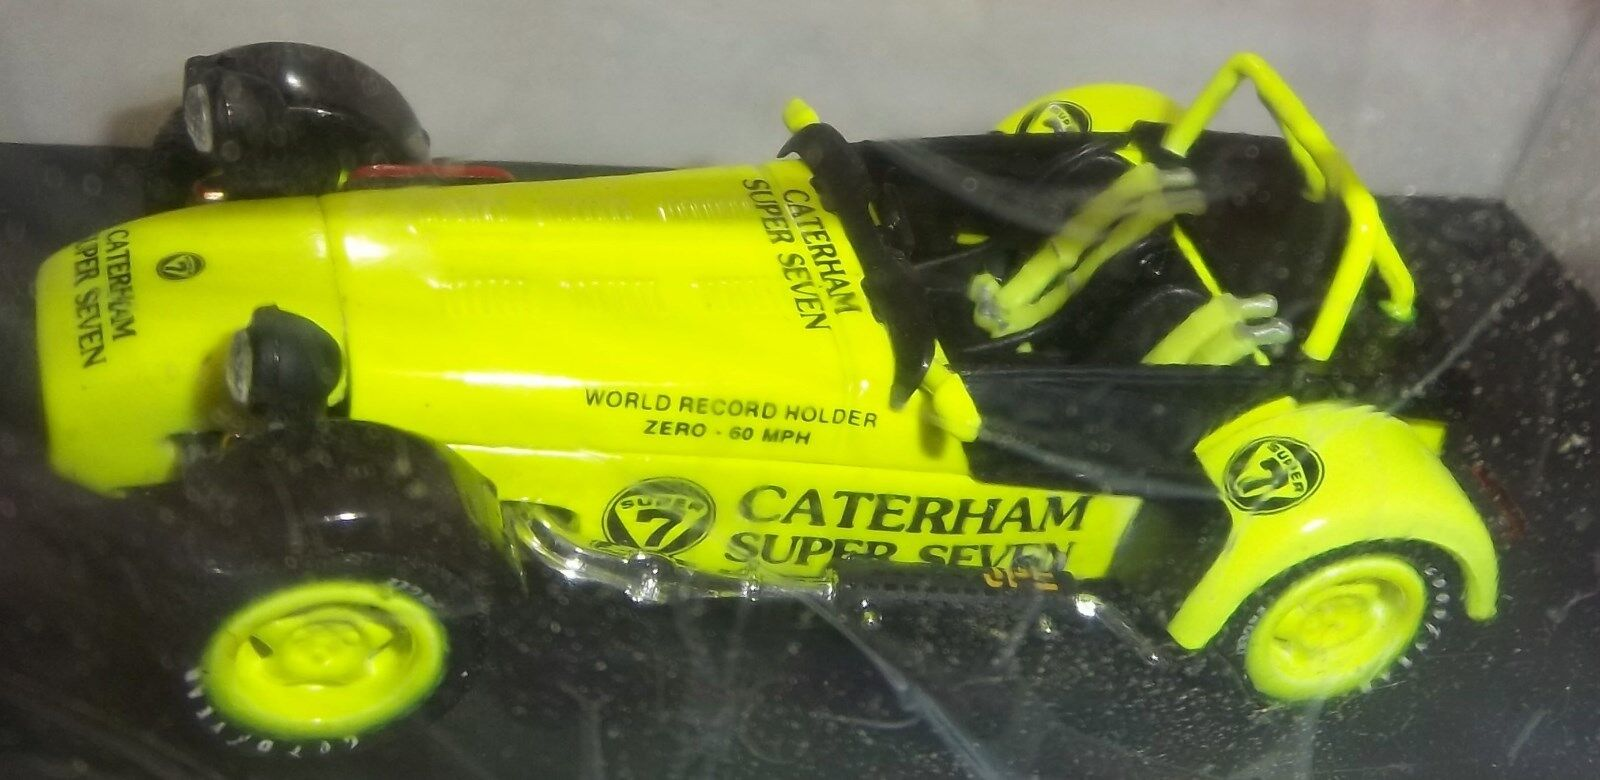 CATERHAM lotus 7 SEVEN JPE 1 43 Eléctrico giallo Pintura récord Maker Super 7 Lotus